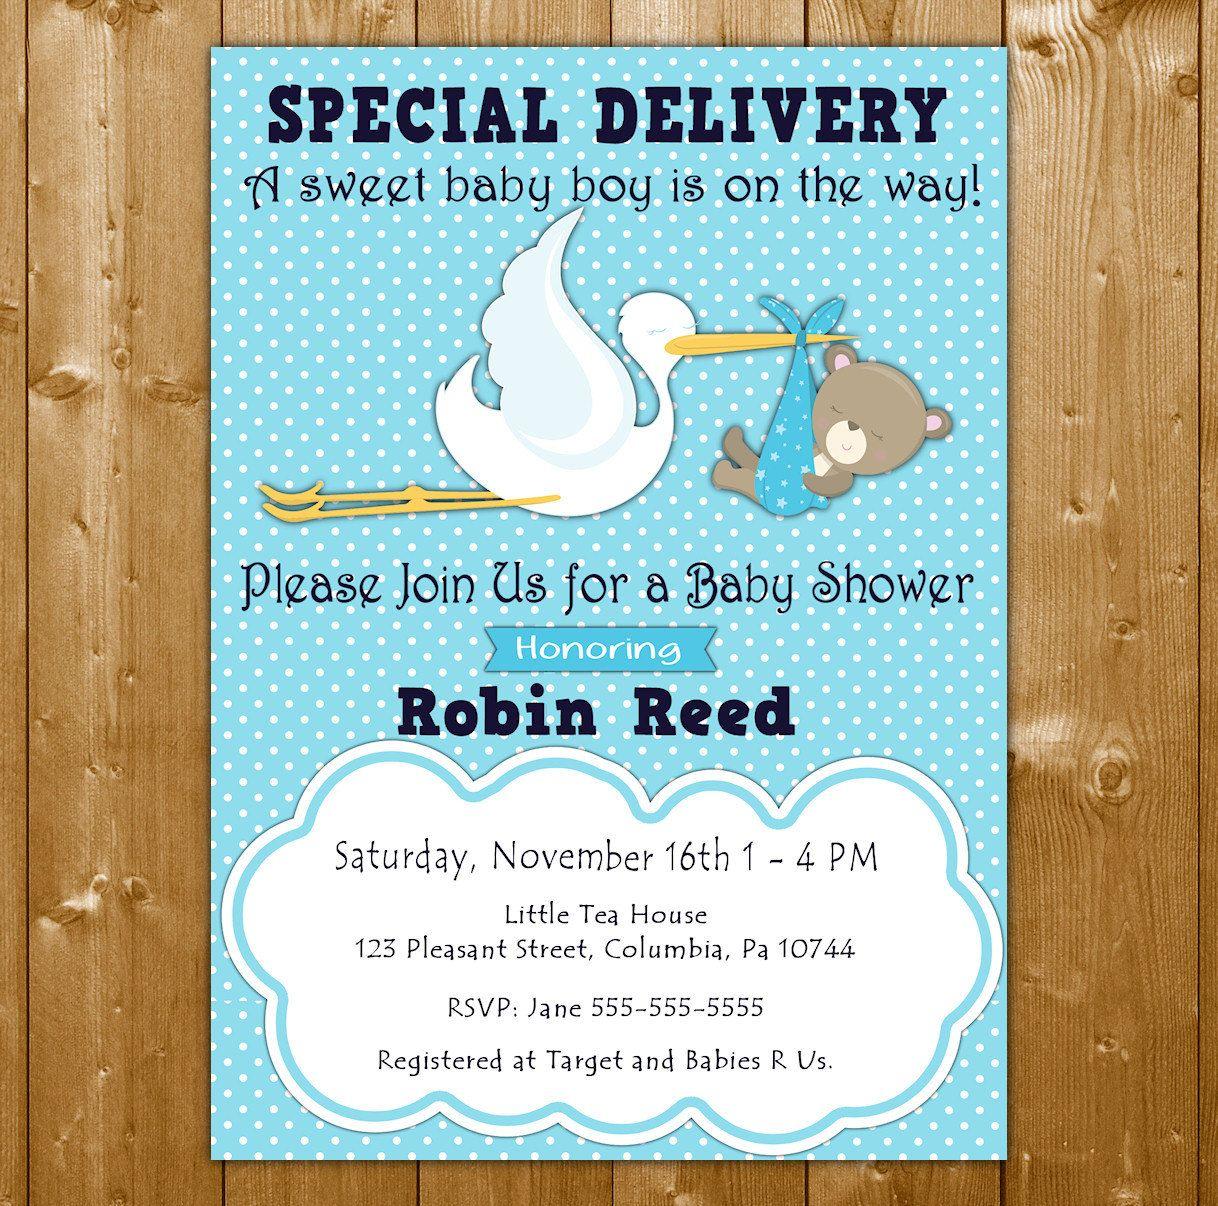 Stork Baby Shower Invitation - Baby Shower Invitation for a Boy ...